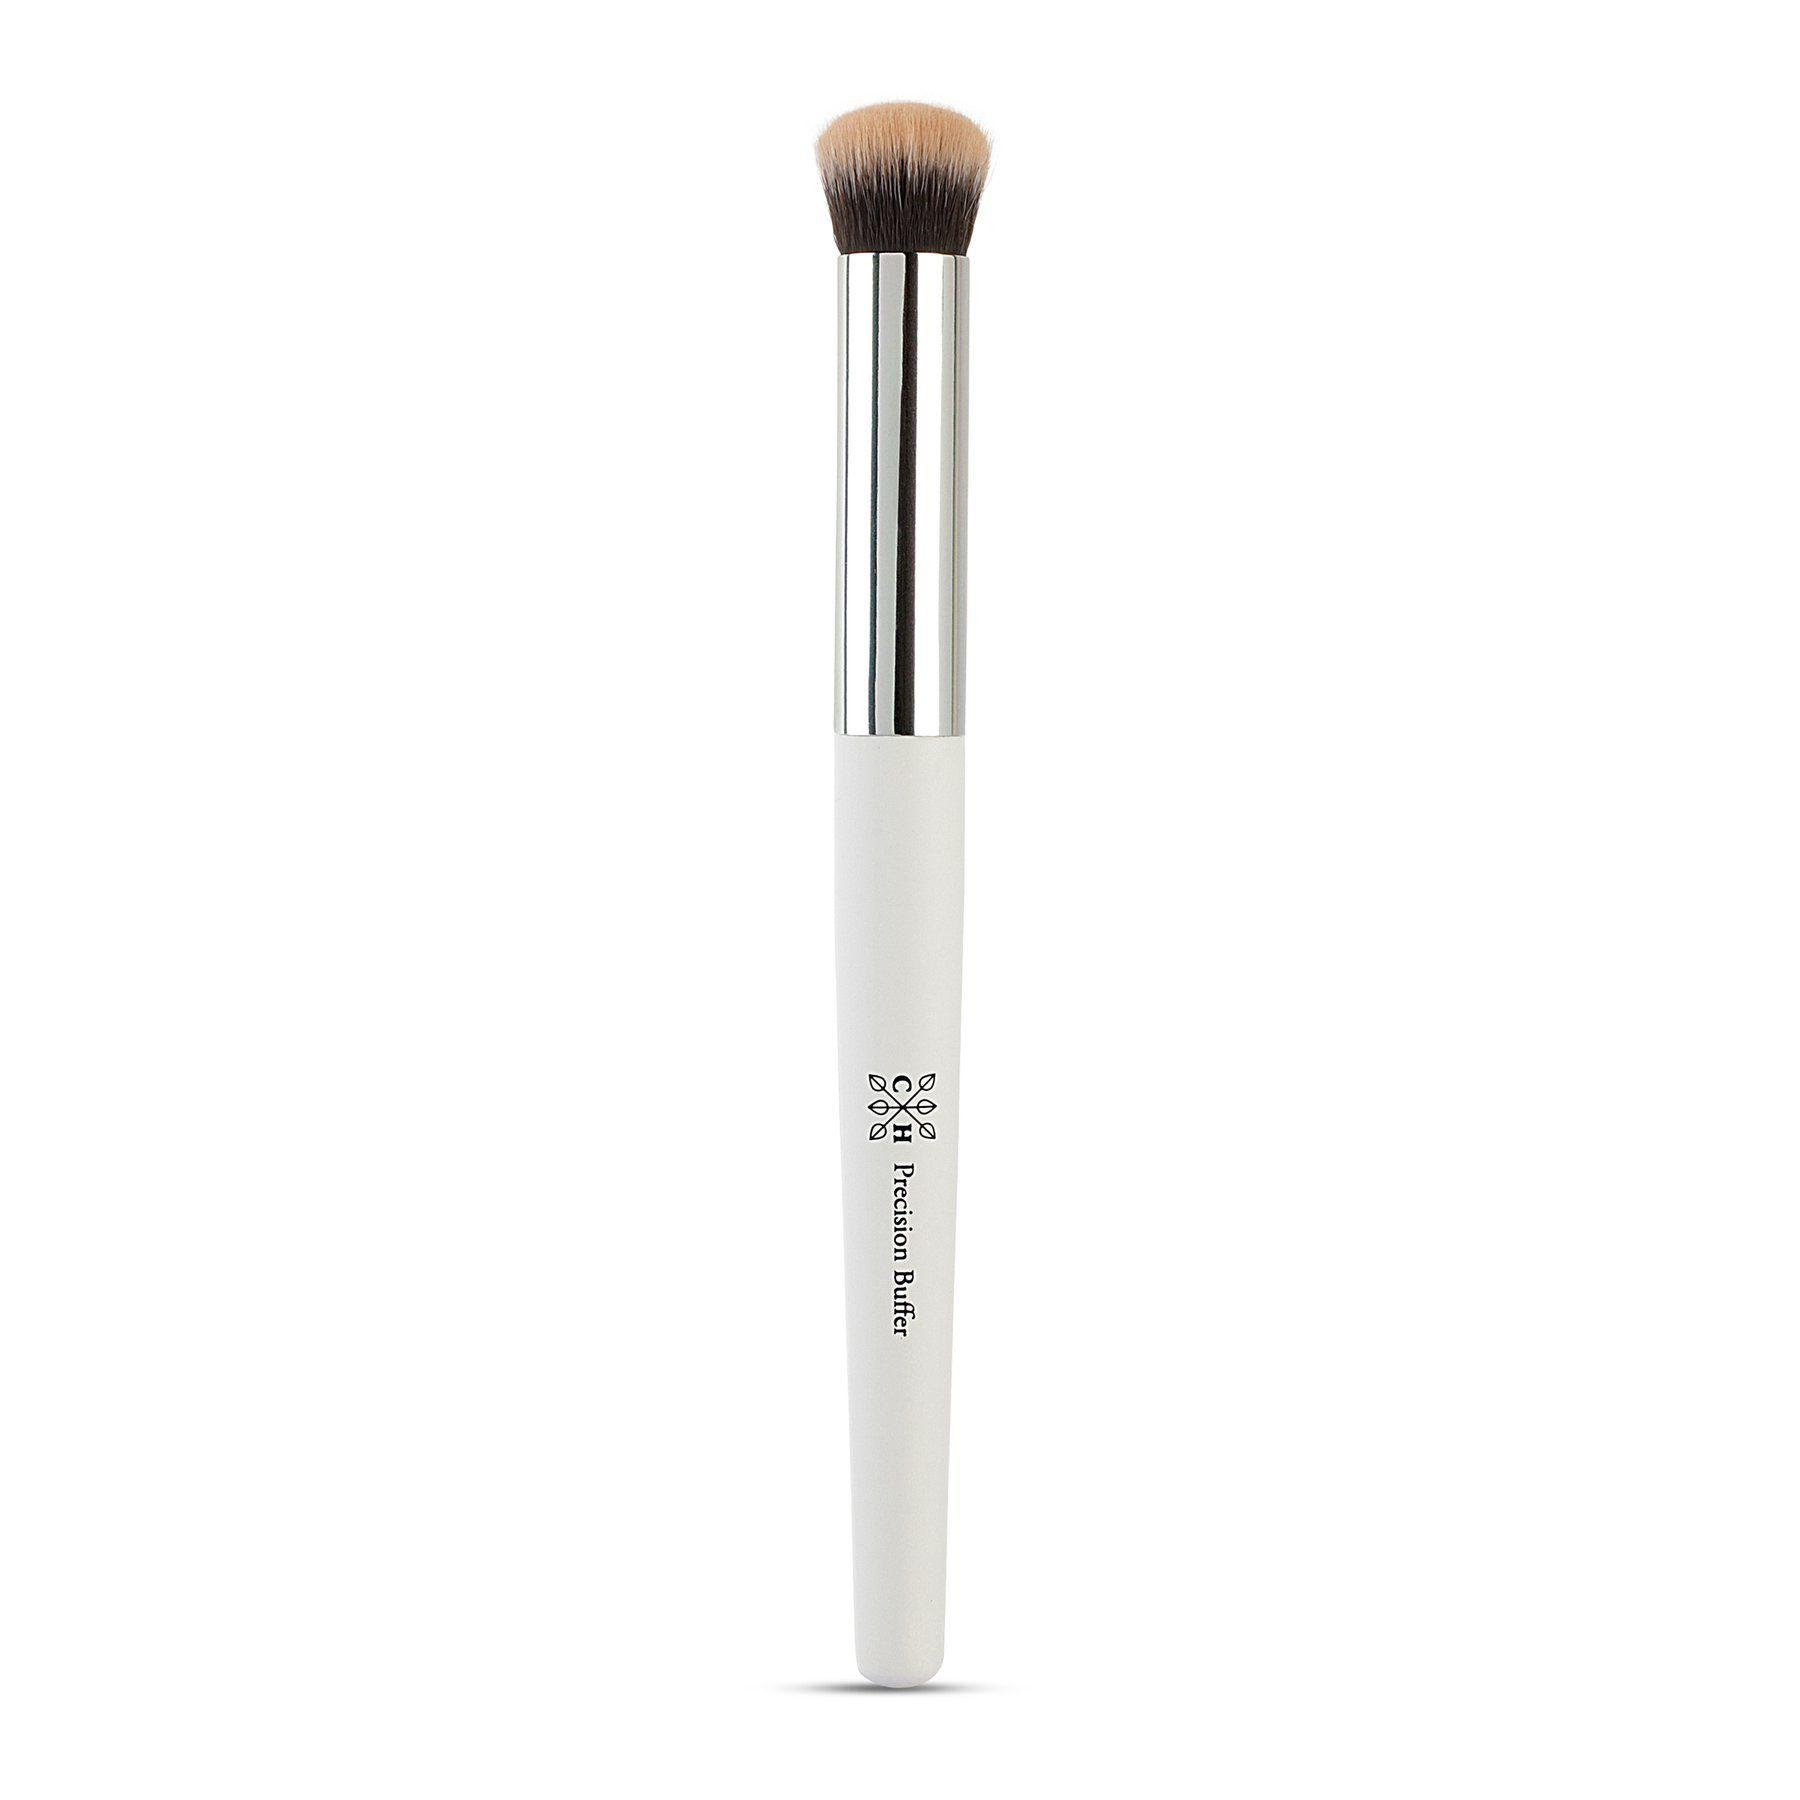 Clove + Hallow Precision Buffer Brush